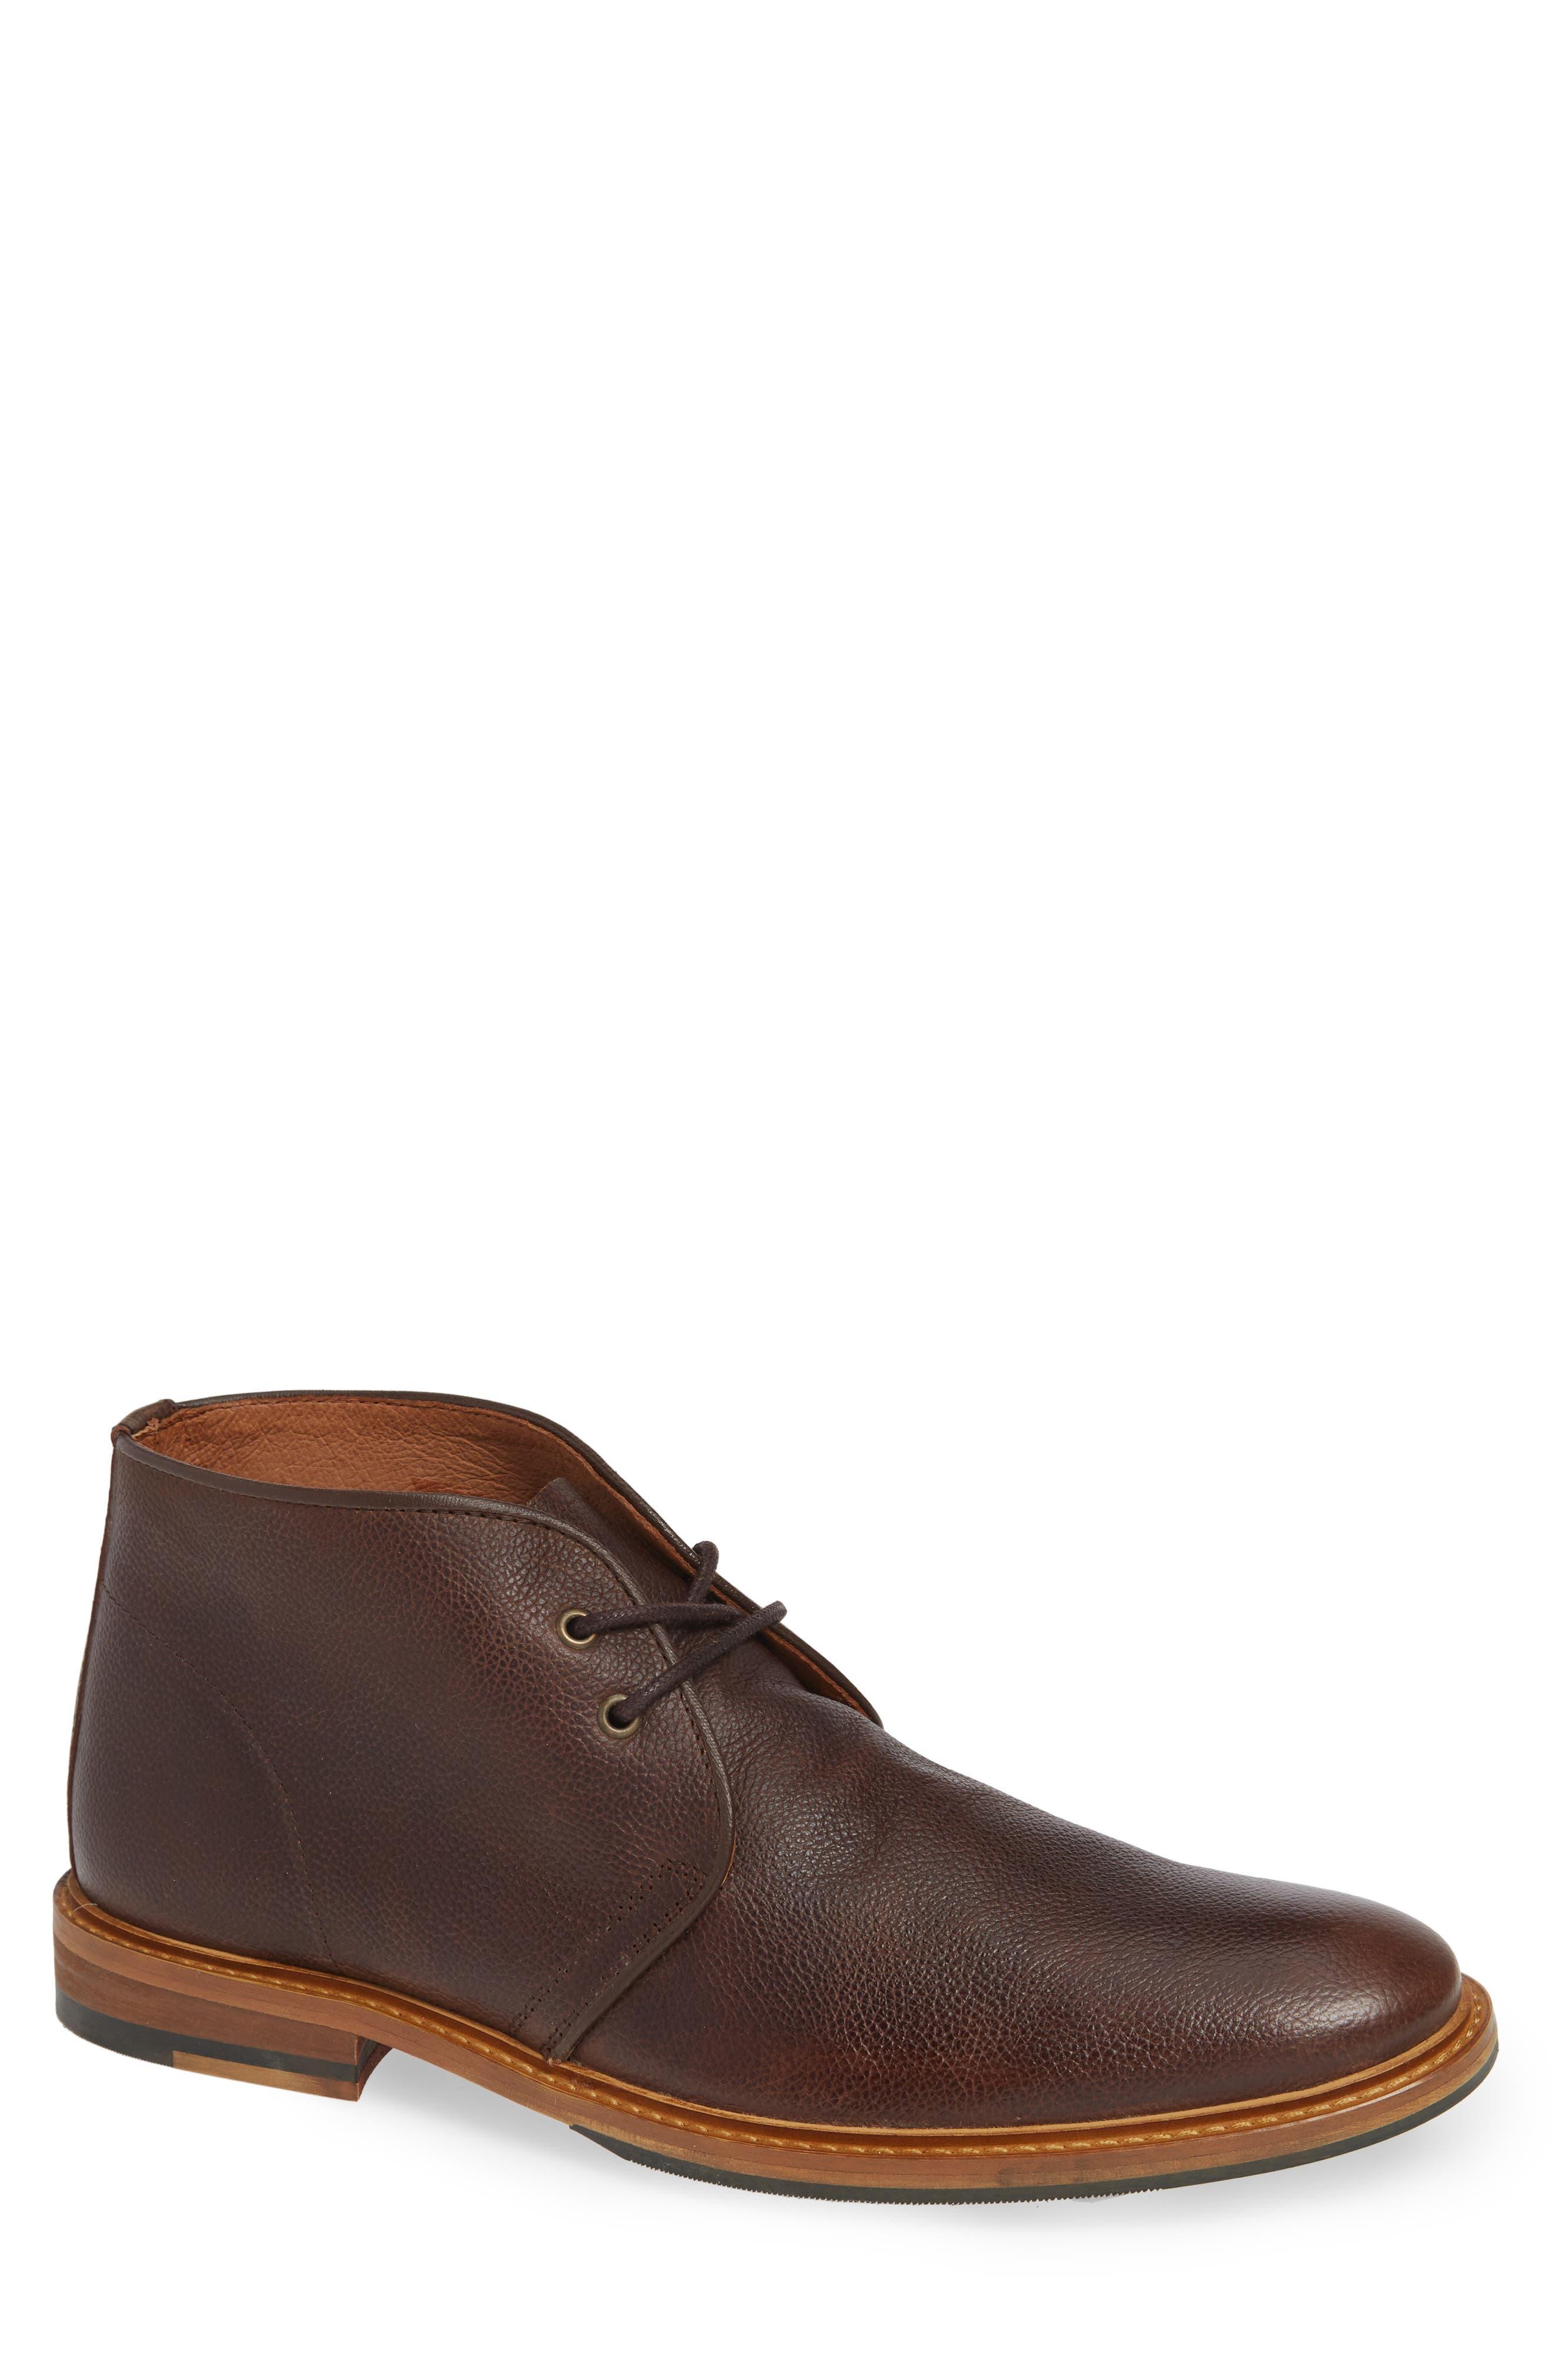 SUPPLY LAB Eli Chukka Boot in Brown